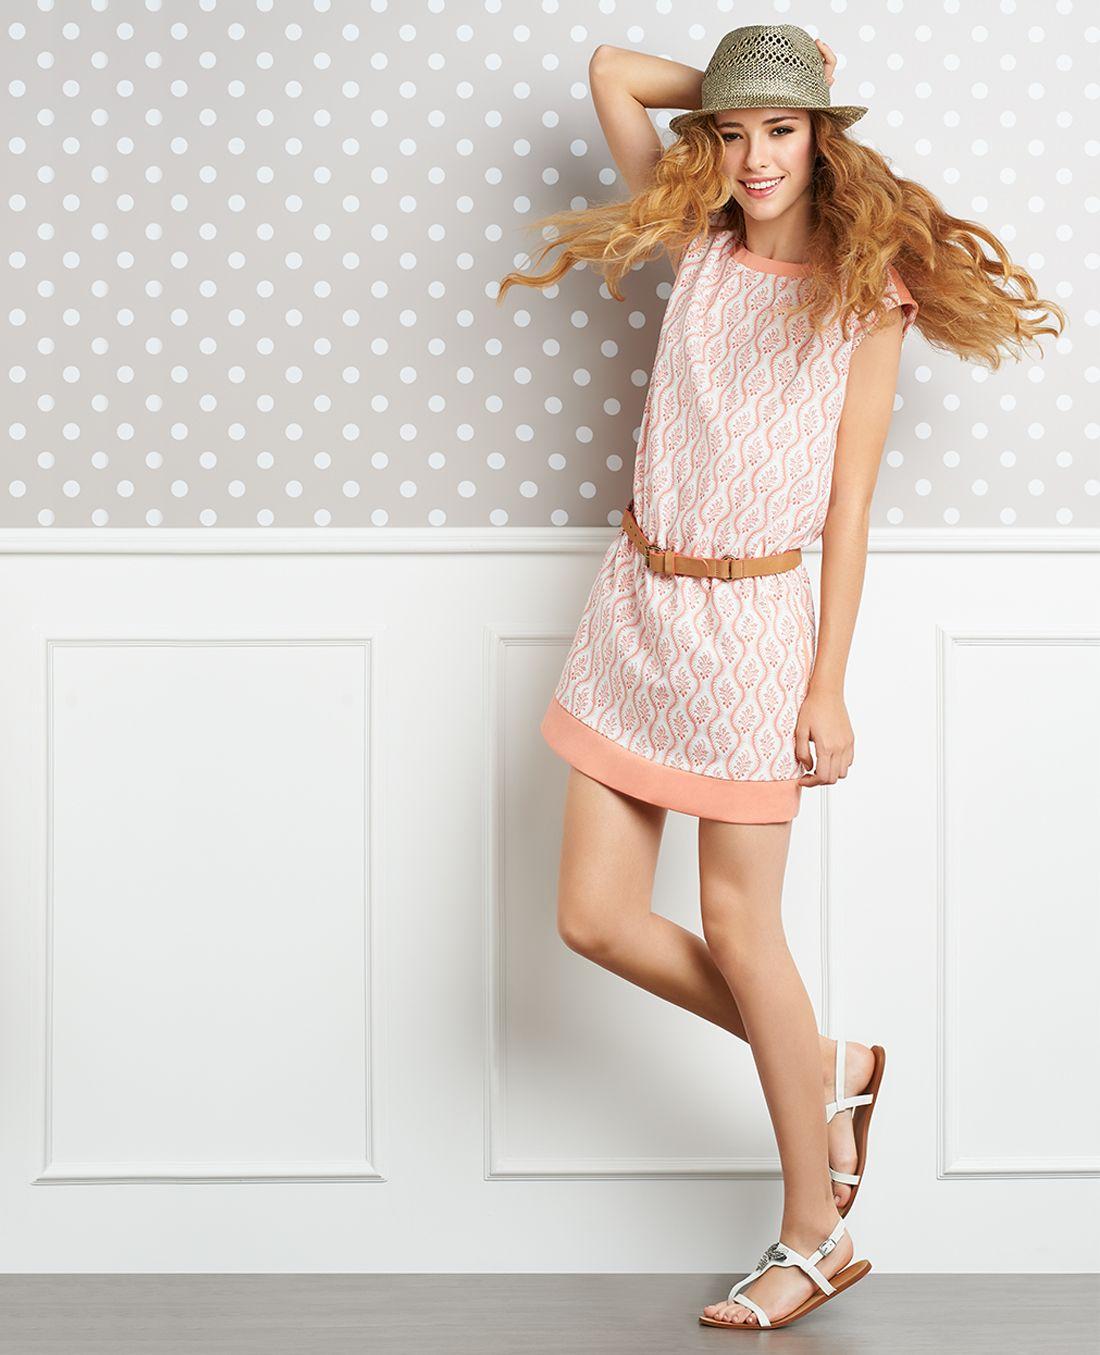 Pink dress from stranger things  Look Book Julio  NAF NAF  ropita  Pinterest